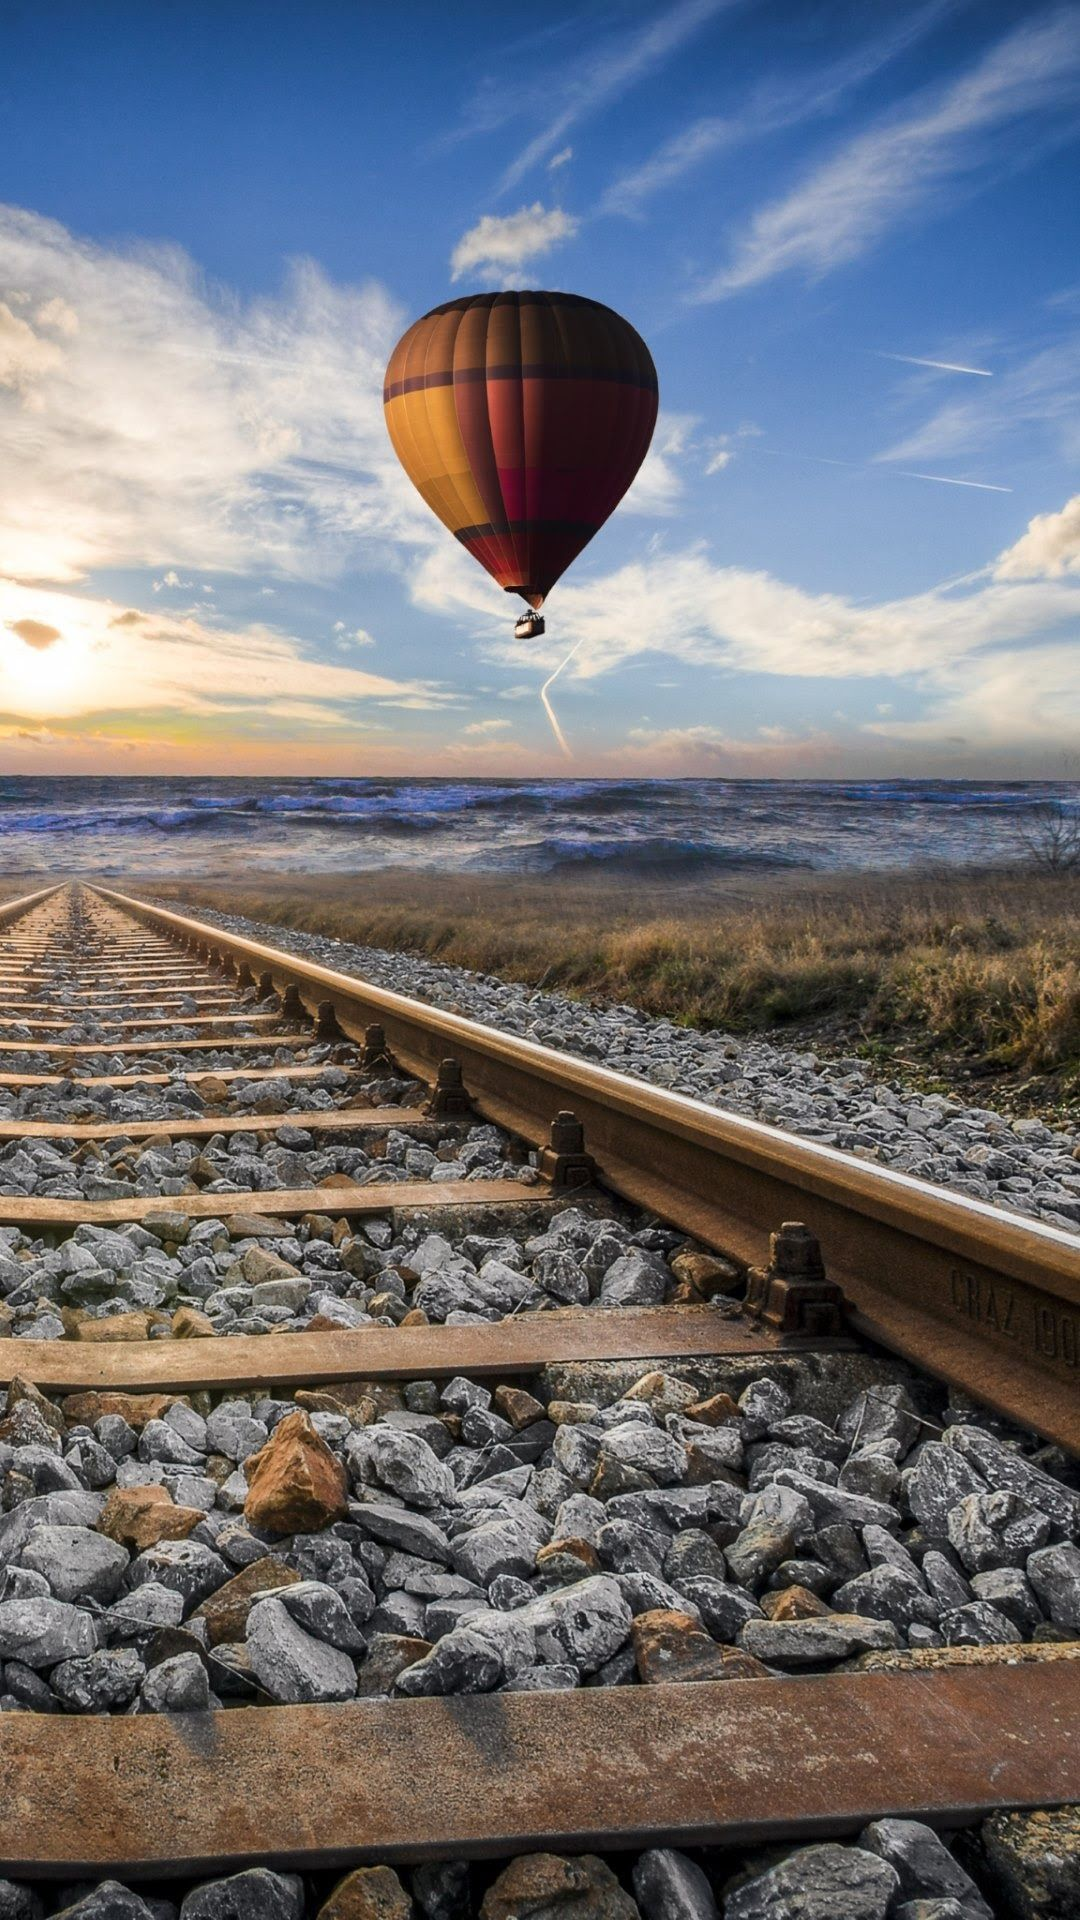 Train Tracks 4K Mobile Wallpapers - Top Free Train Tracks ...